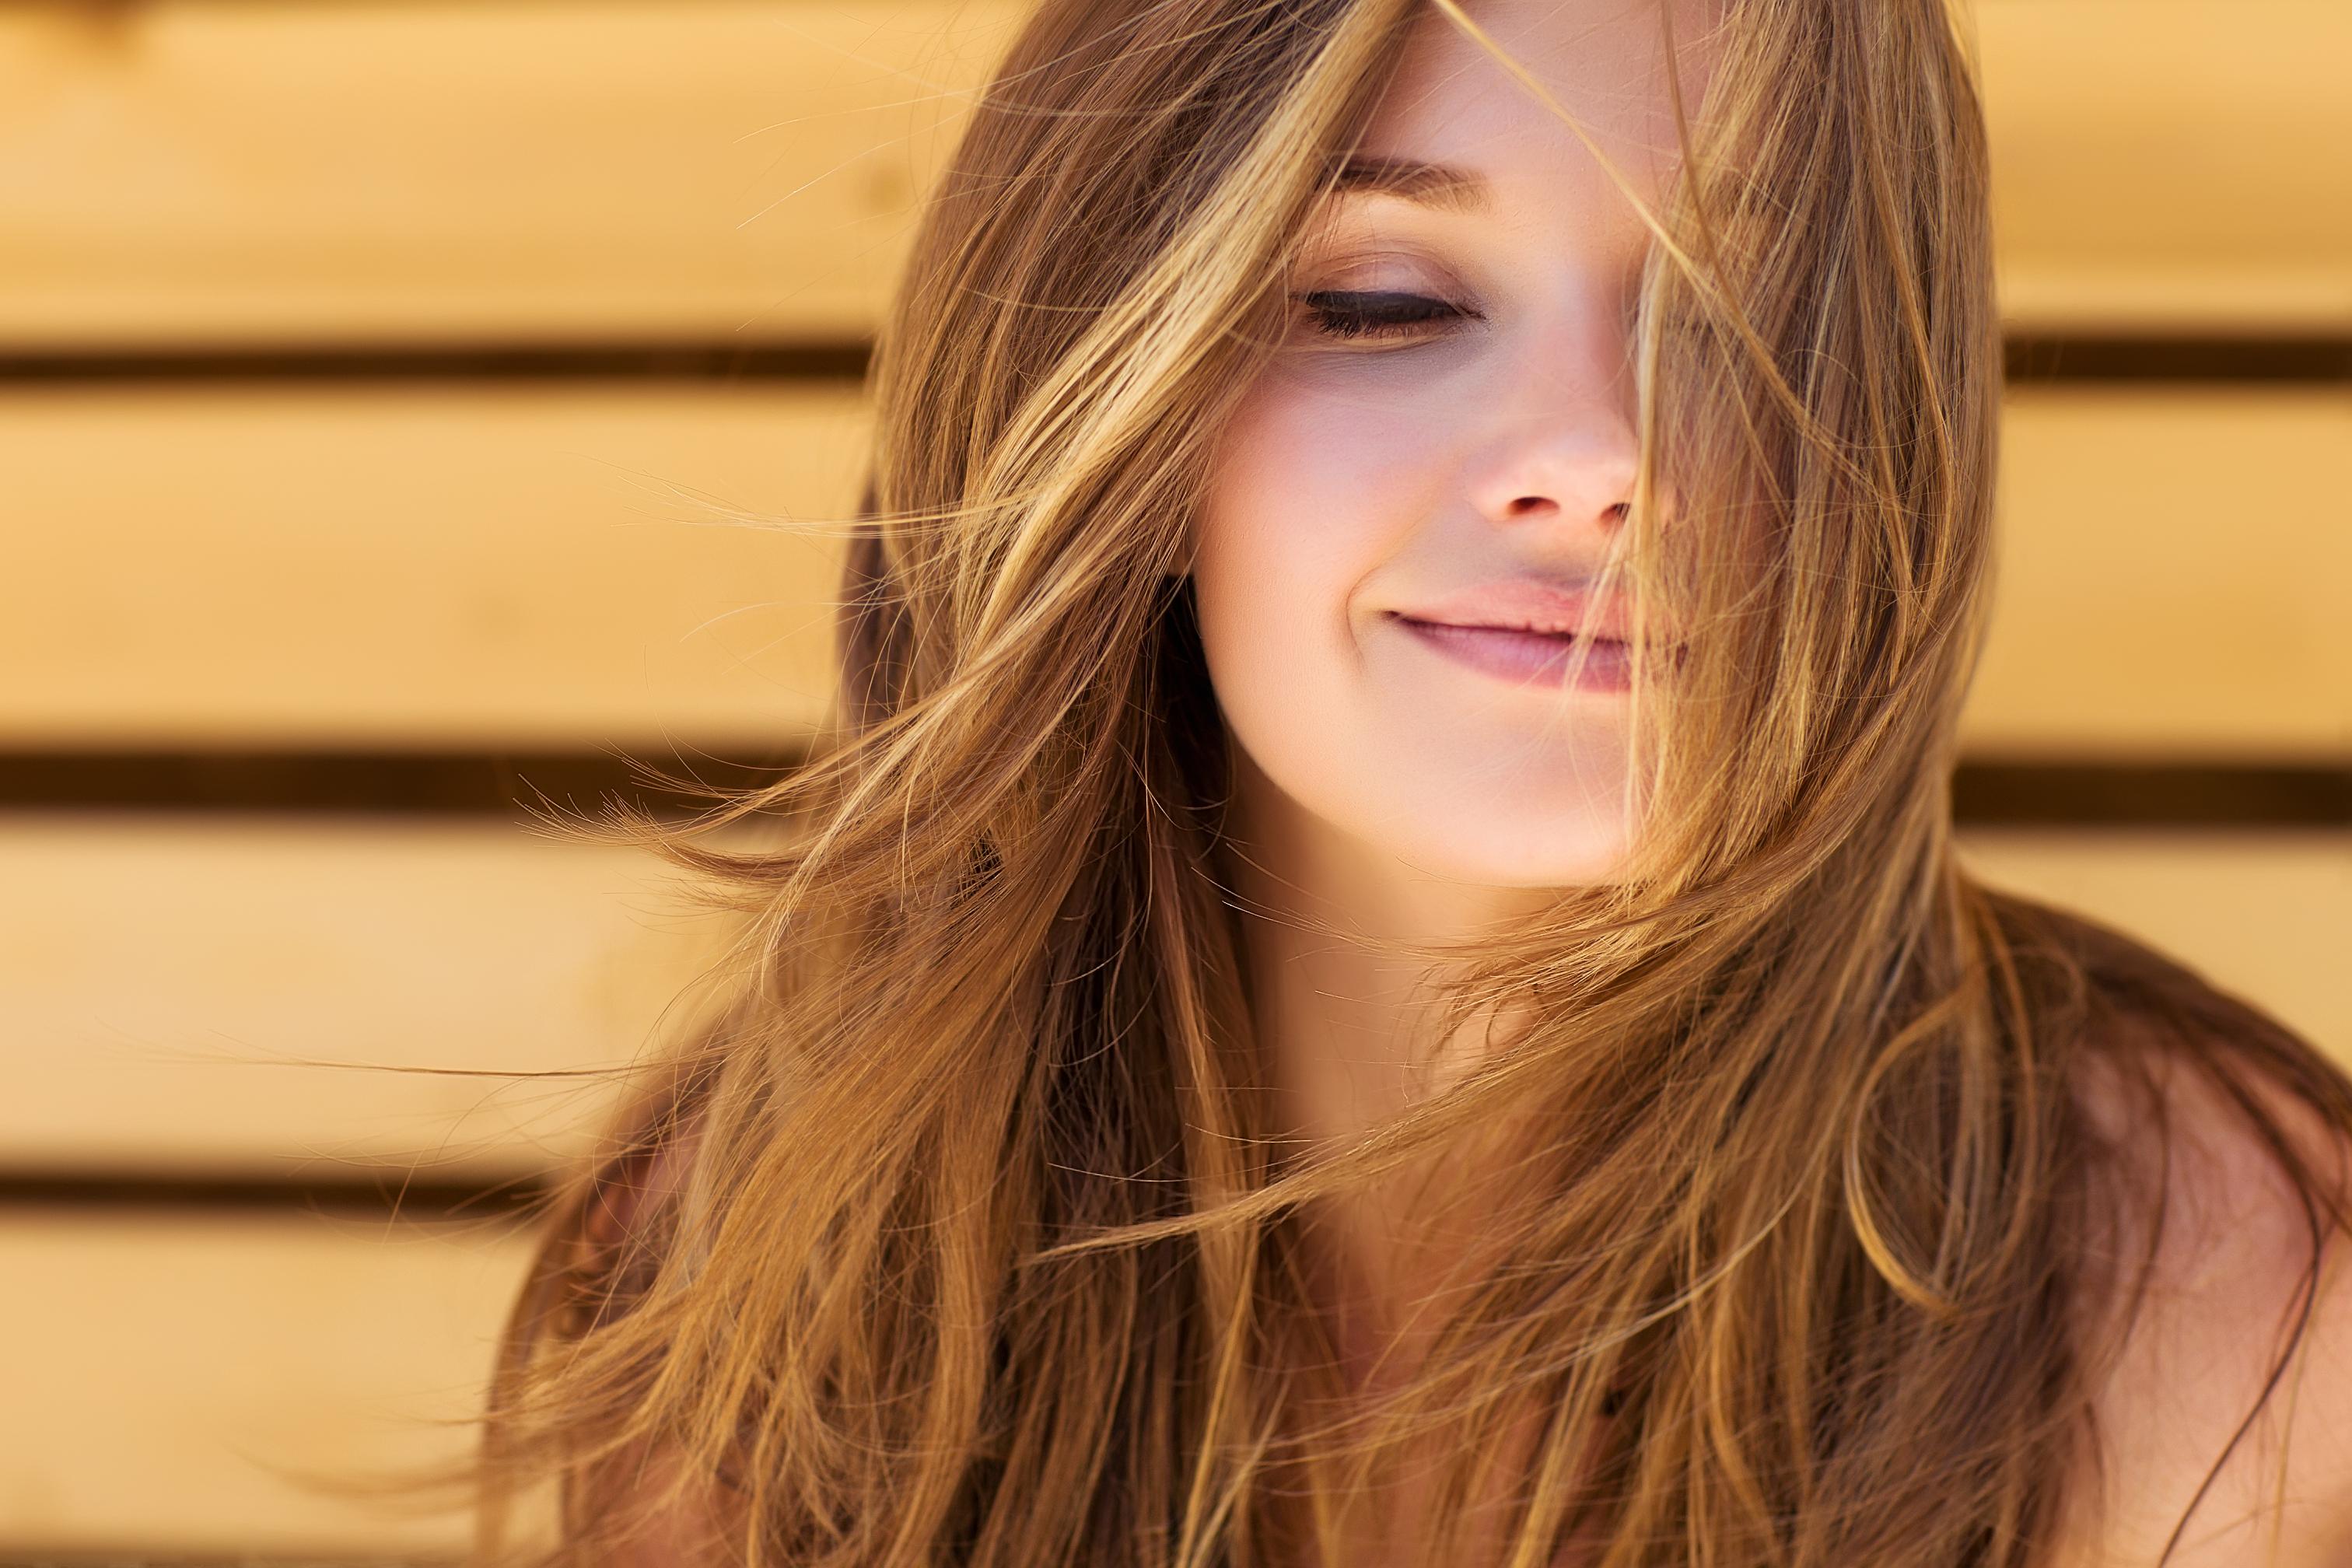 Hair Restoration Treatments To Make You Feel Fantastic